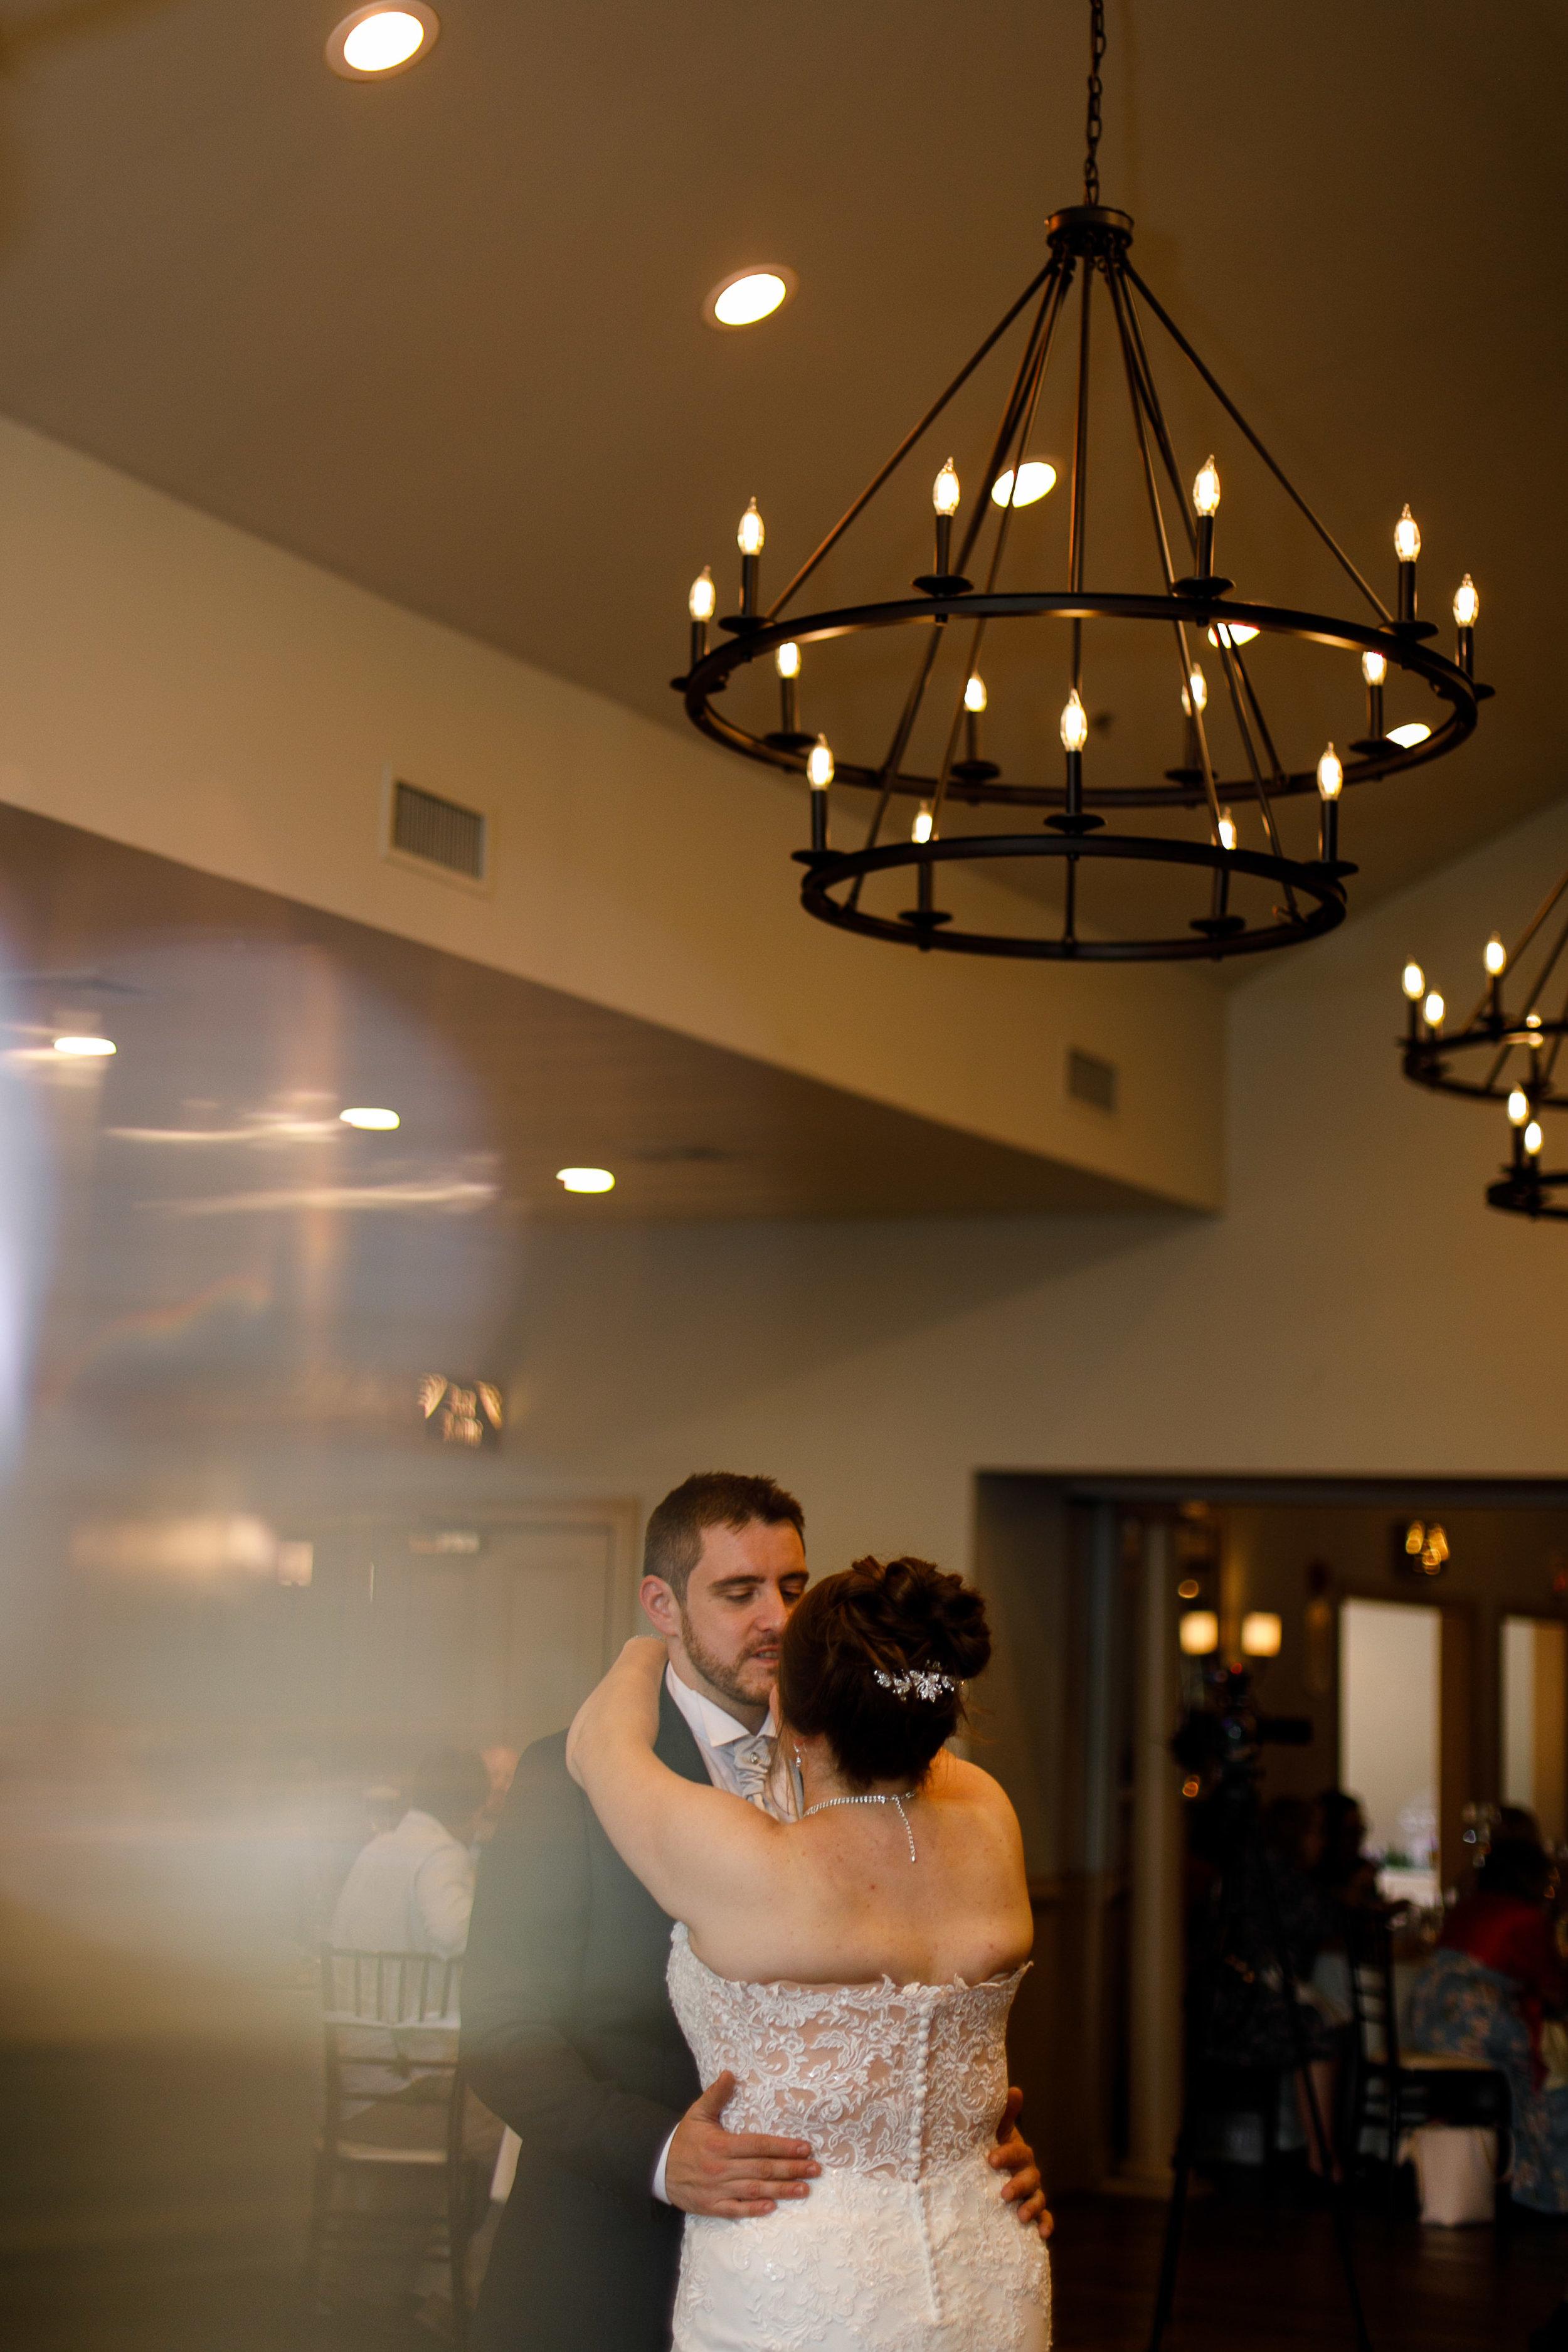 Wedding at Joseph Ambler In Bucks County PA36.jpg